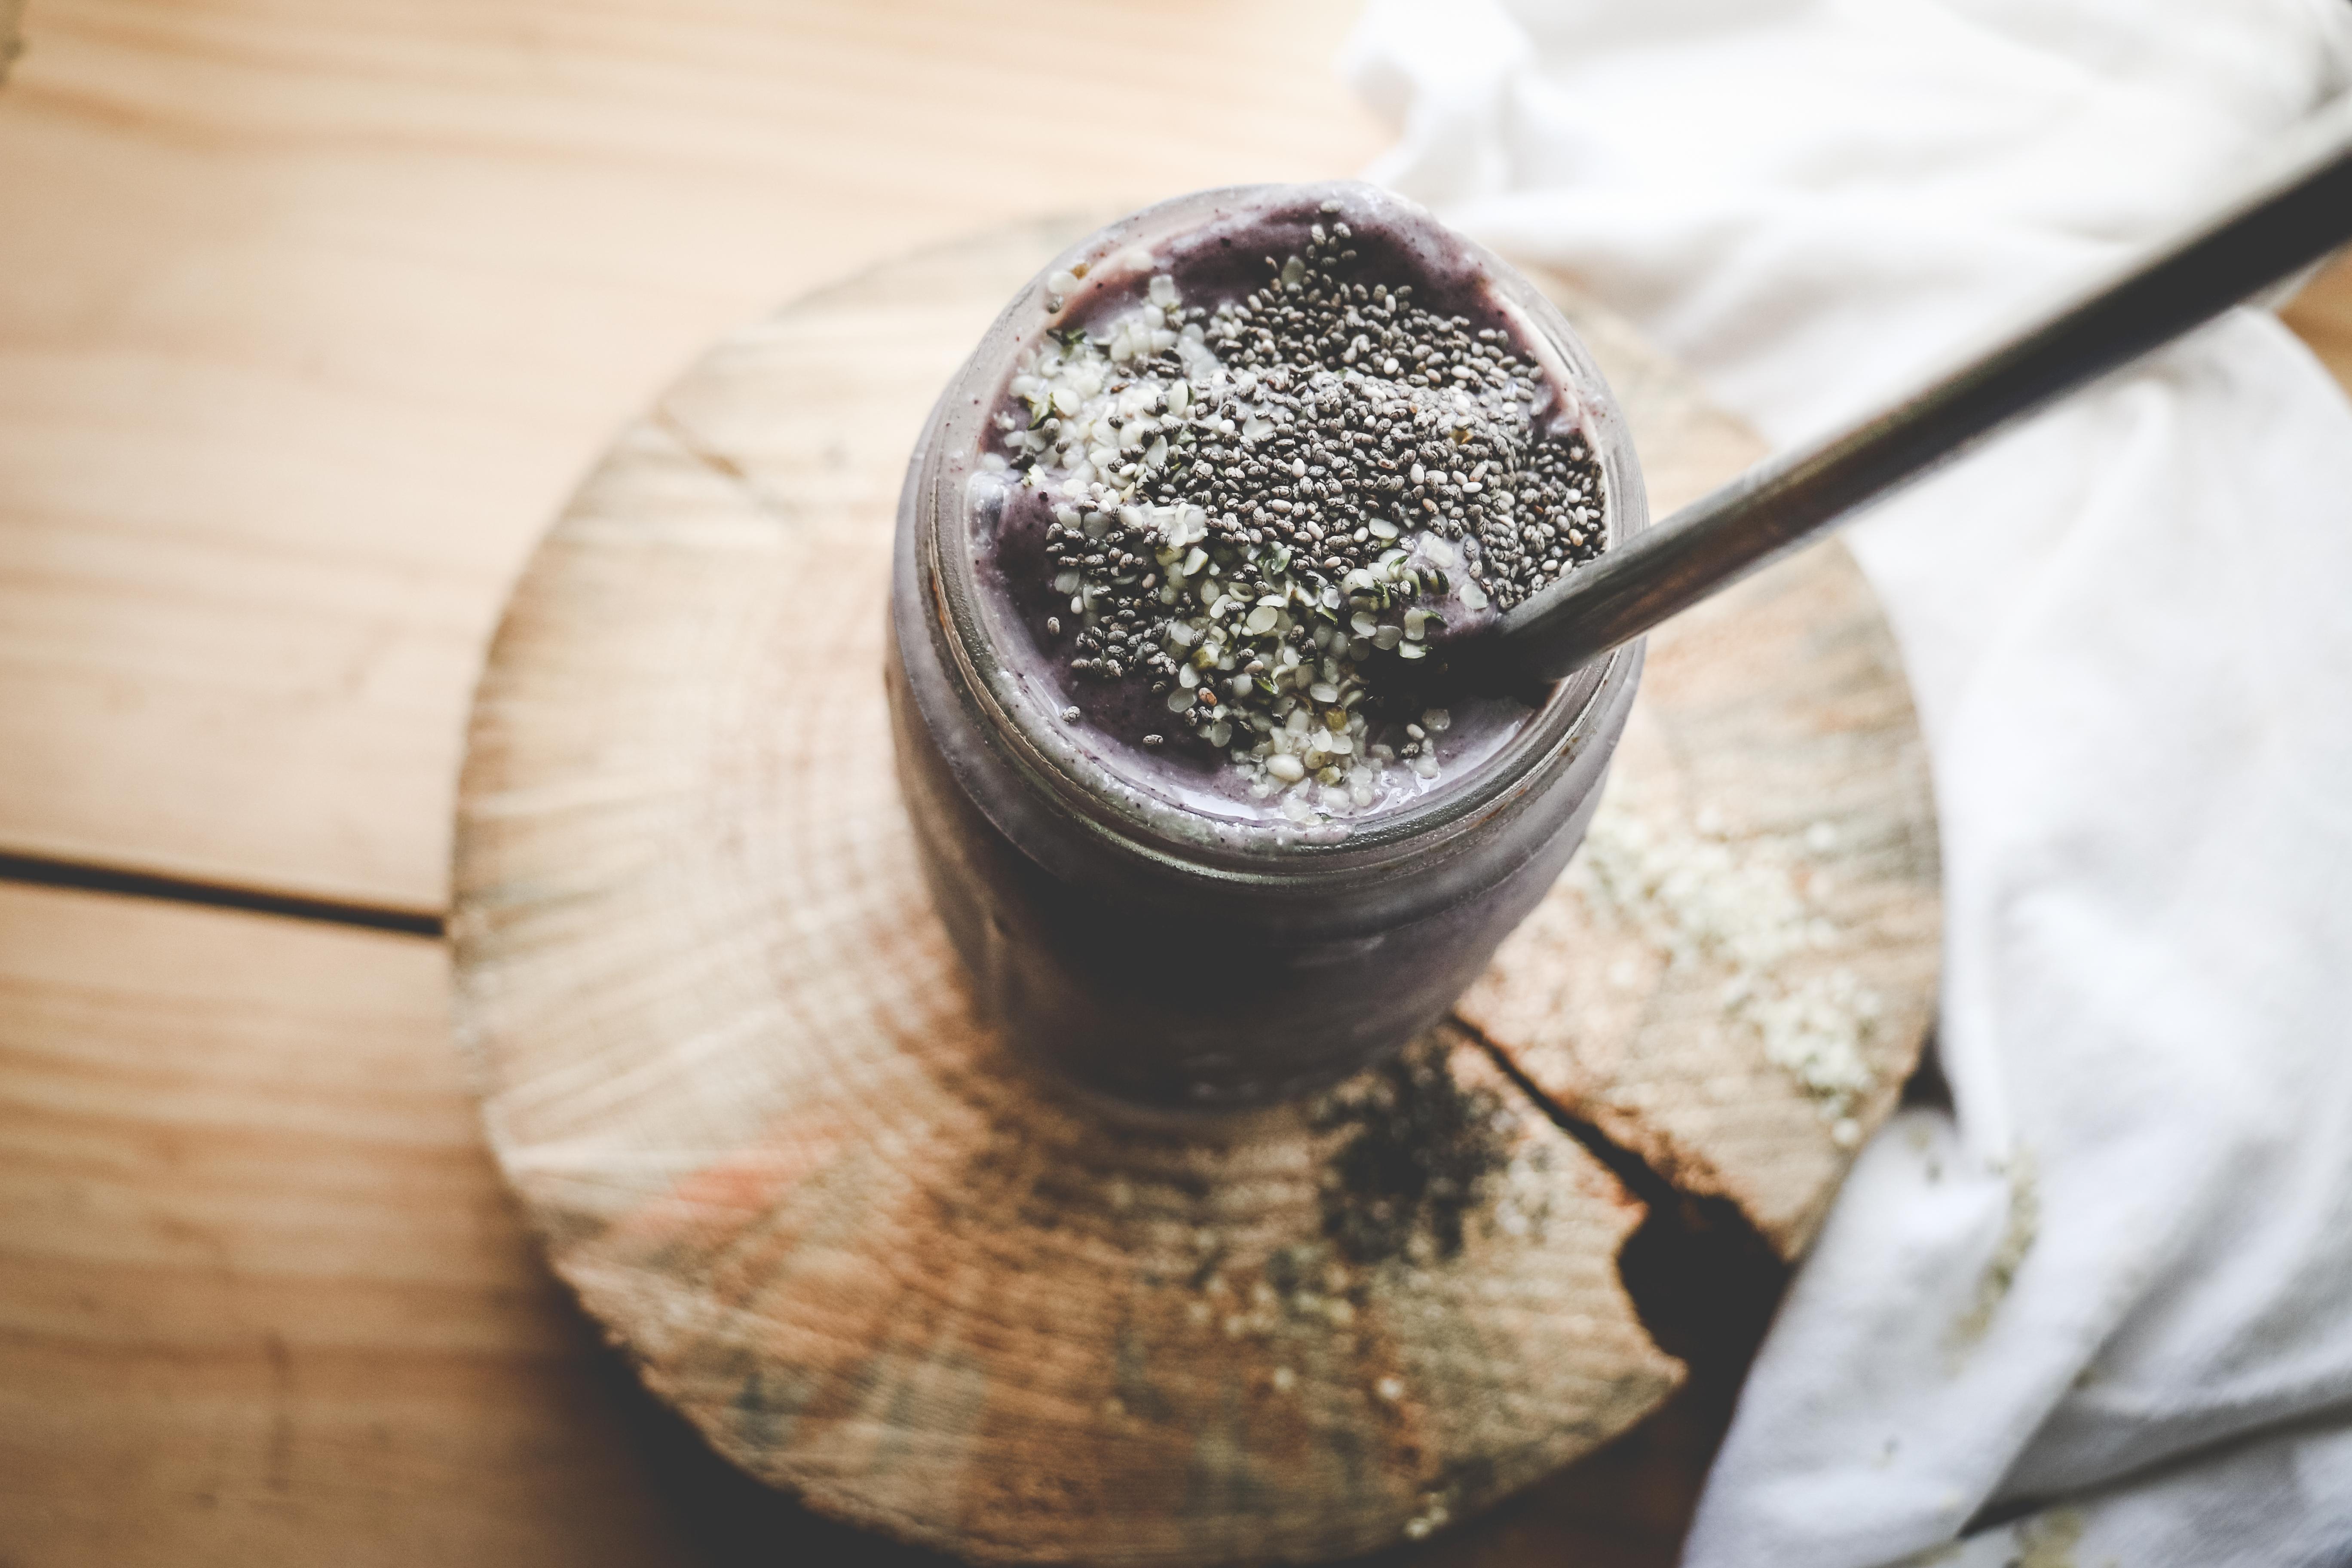 Blueberry-Cardamom Smoothie